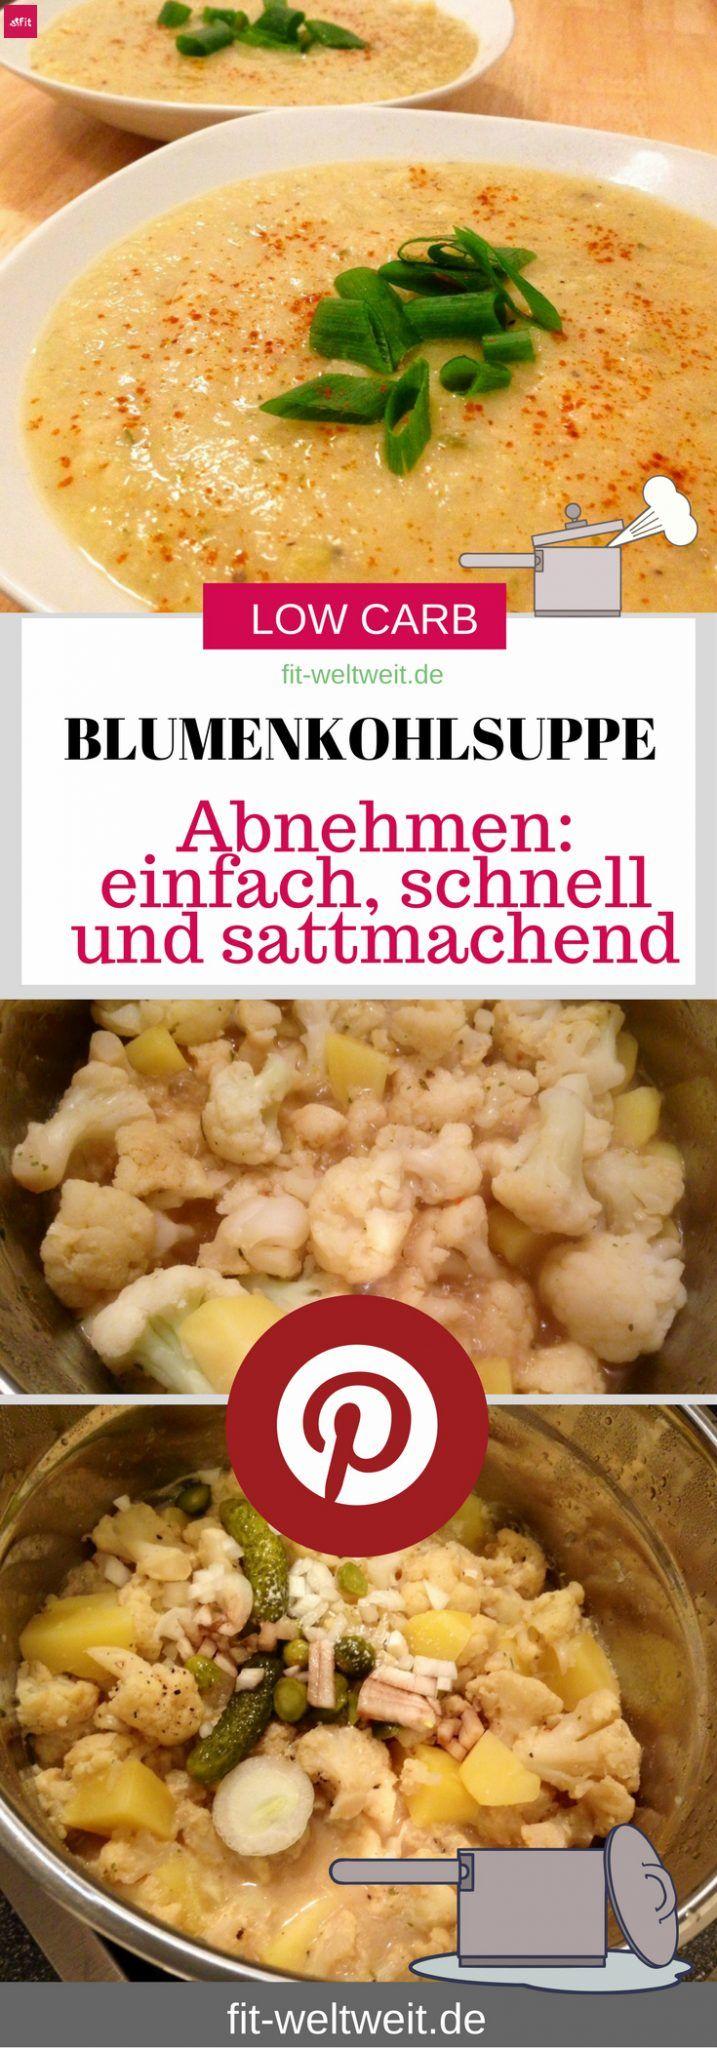 Low Carb Blumenkohlsuppe Rezept Zum Abnehmen Diat Vegan